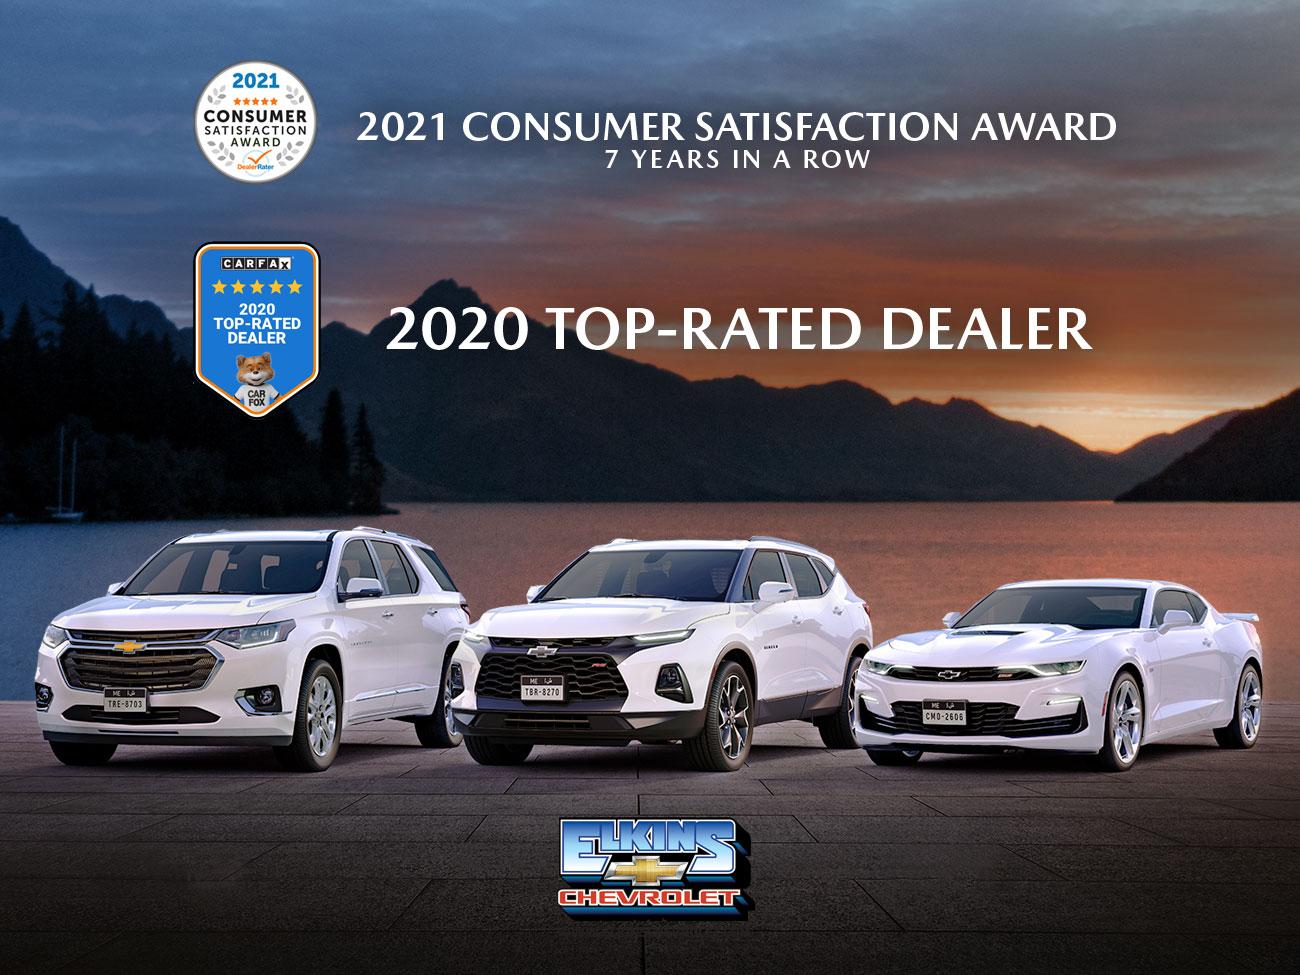 NJ Chevrolet Dealership Awards